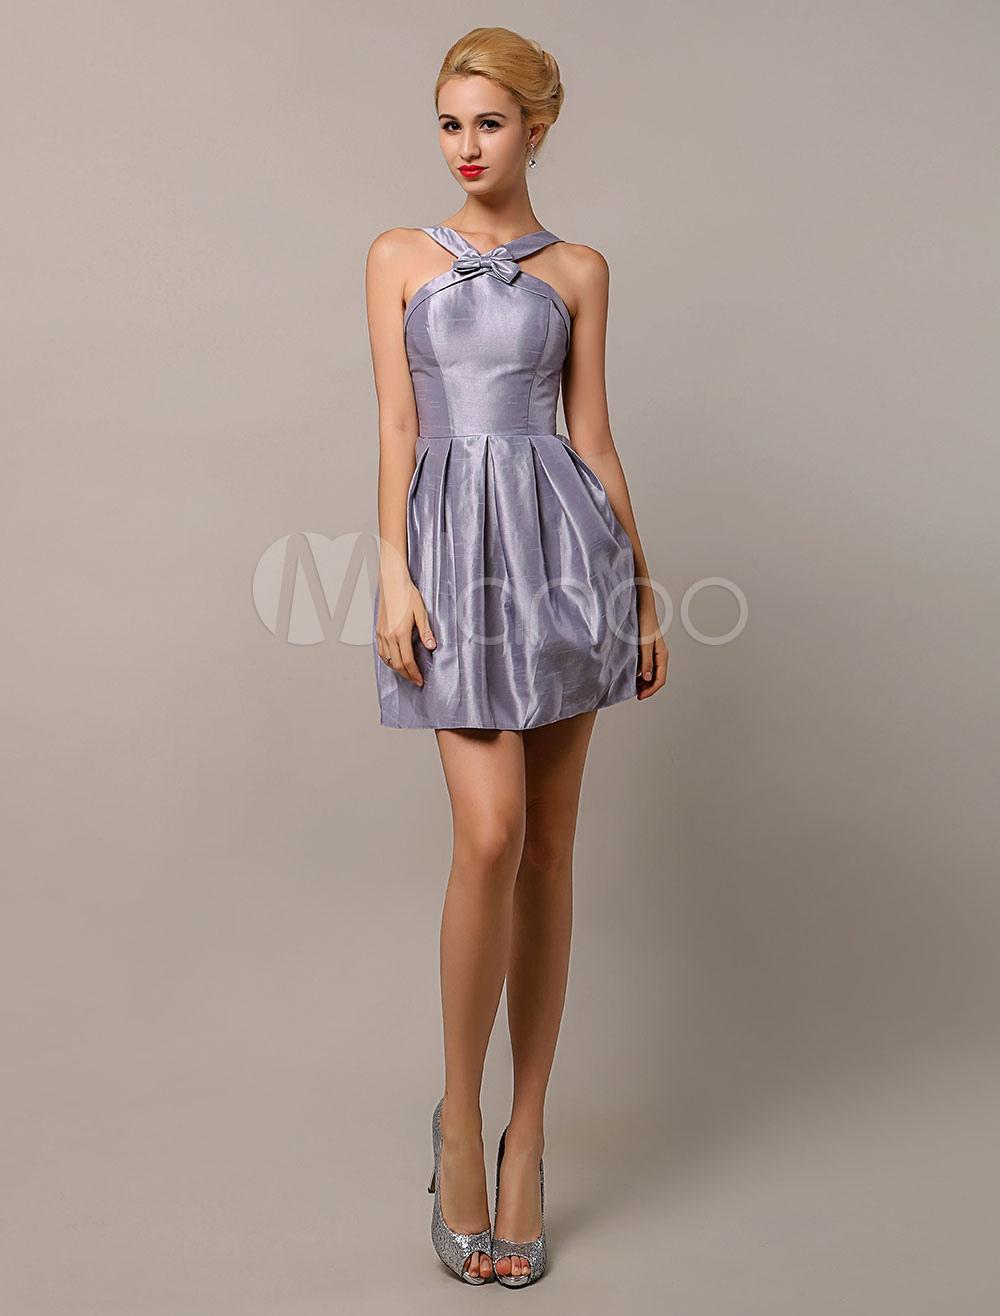 Buy Silver Gray Bridesmaid Dresses Ruched Satin Taffeta Bridesmaid Dress With V Neck Milanoo for $109.99 in Milanoo store